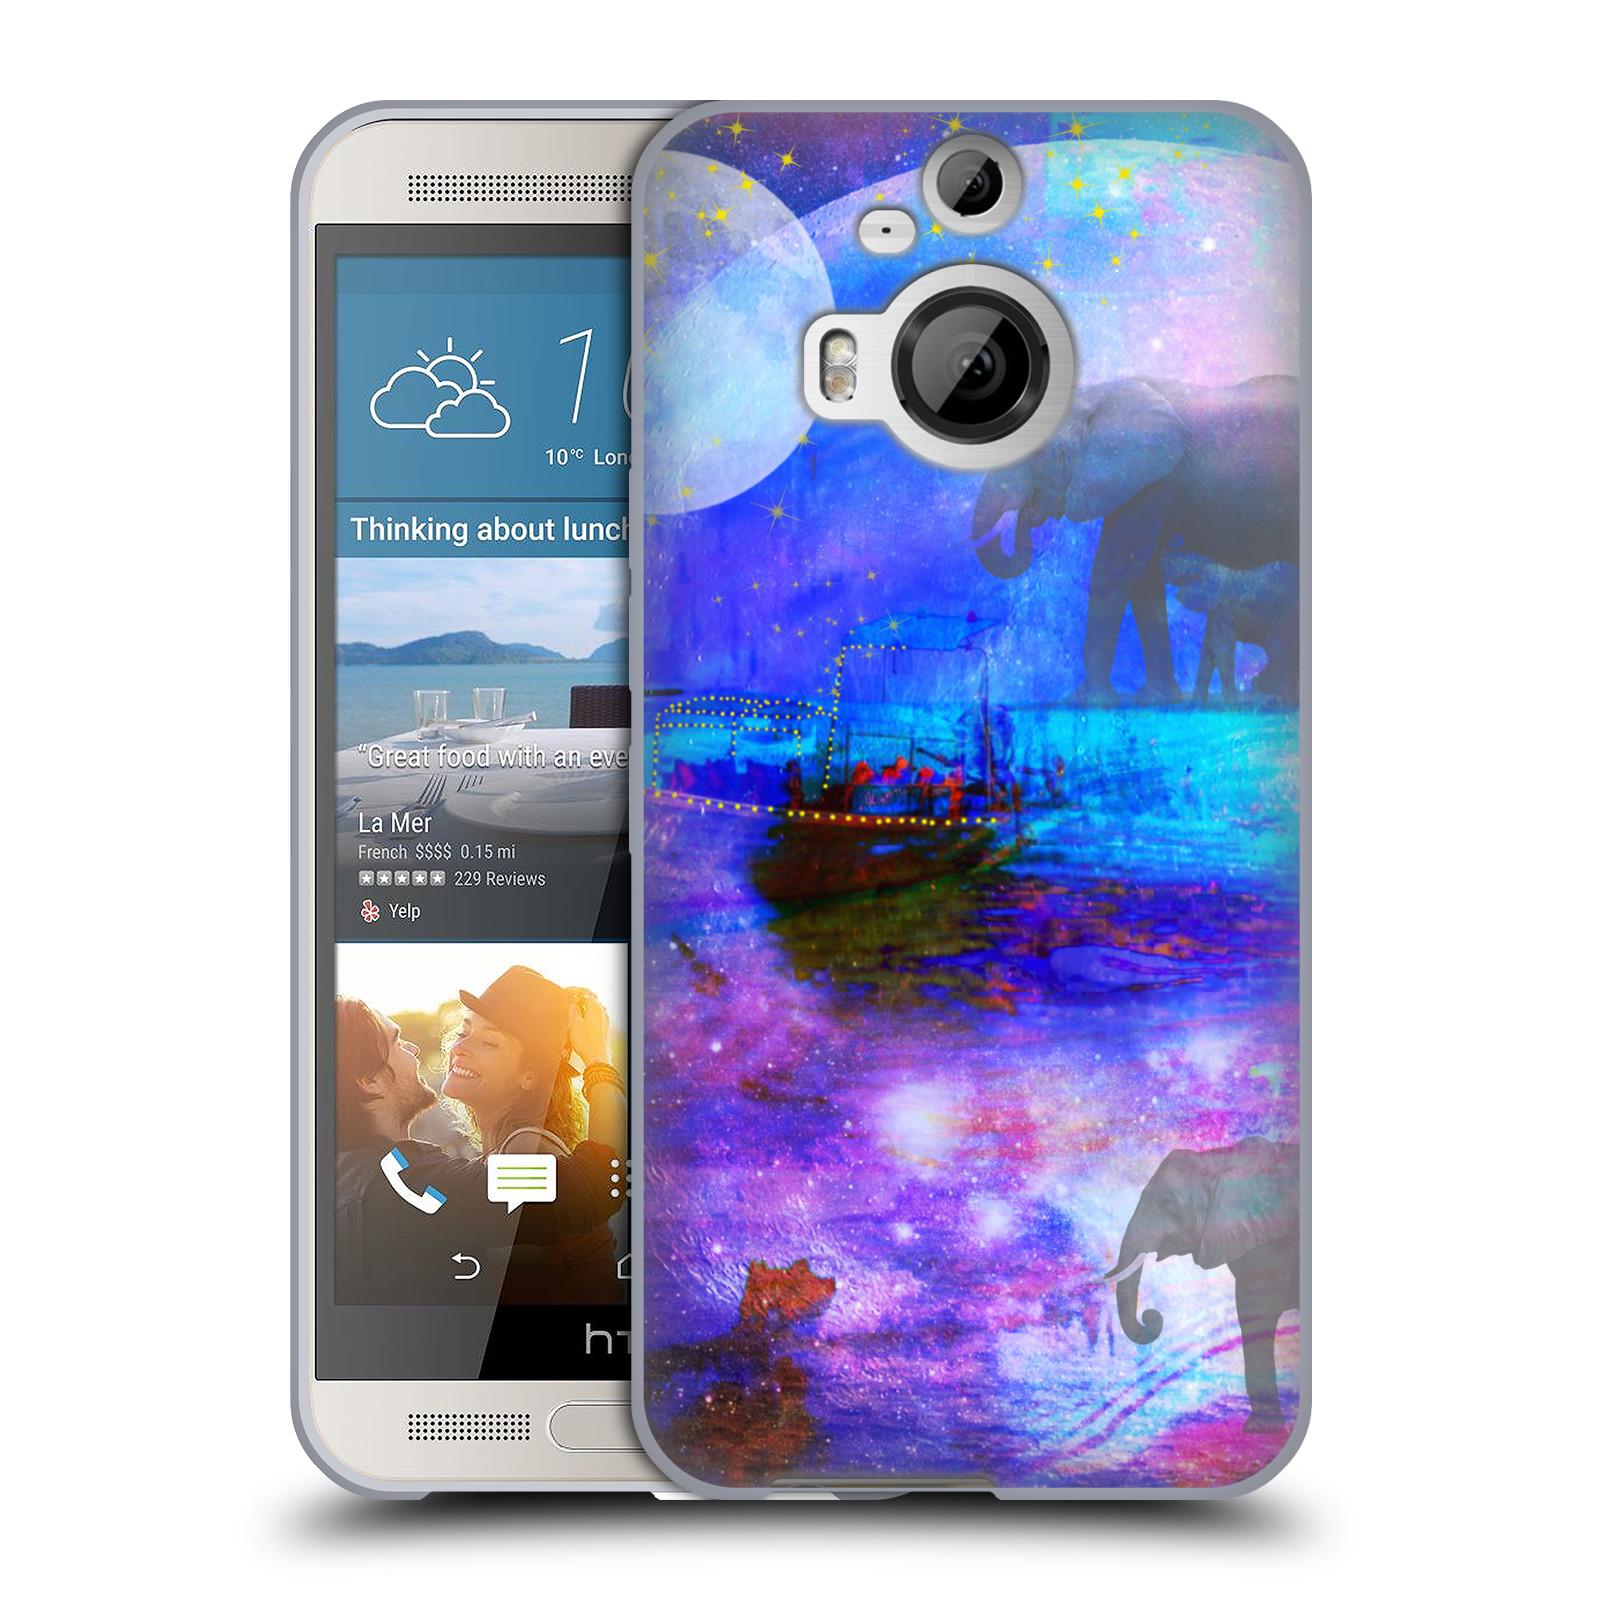 OFFICIAL-HAROULITA-FANTASY-2-SOFT-GEL-CASE-FOR-HTC-PHONES-2